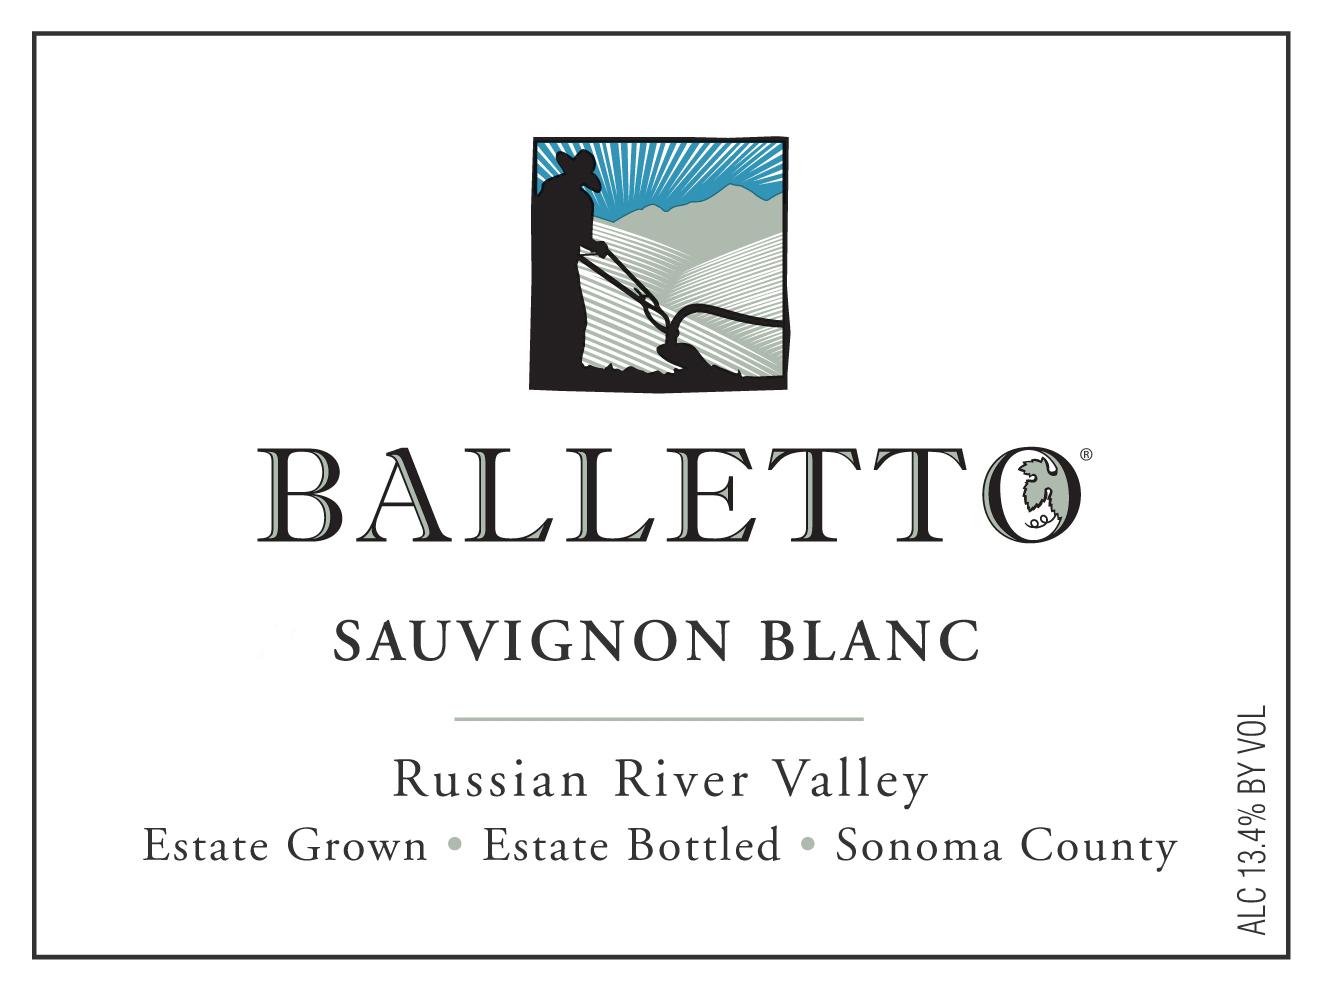 Balletto_Label-Front_SB.jpg